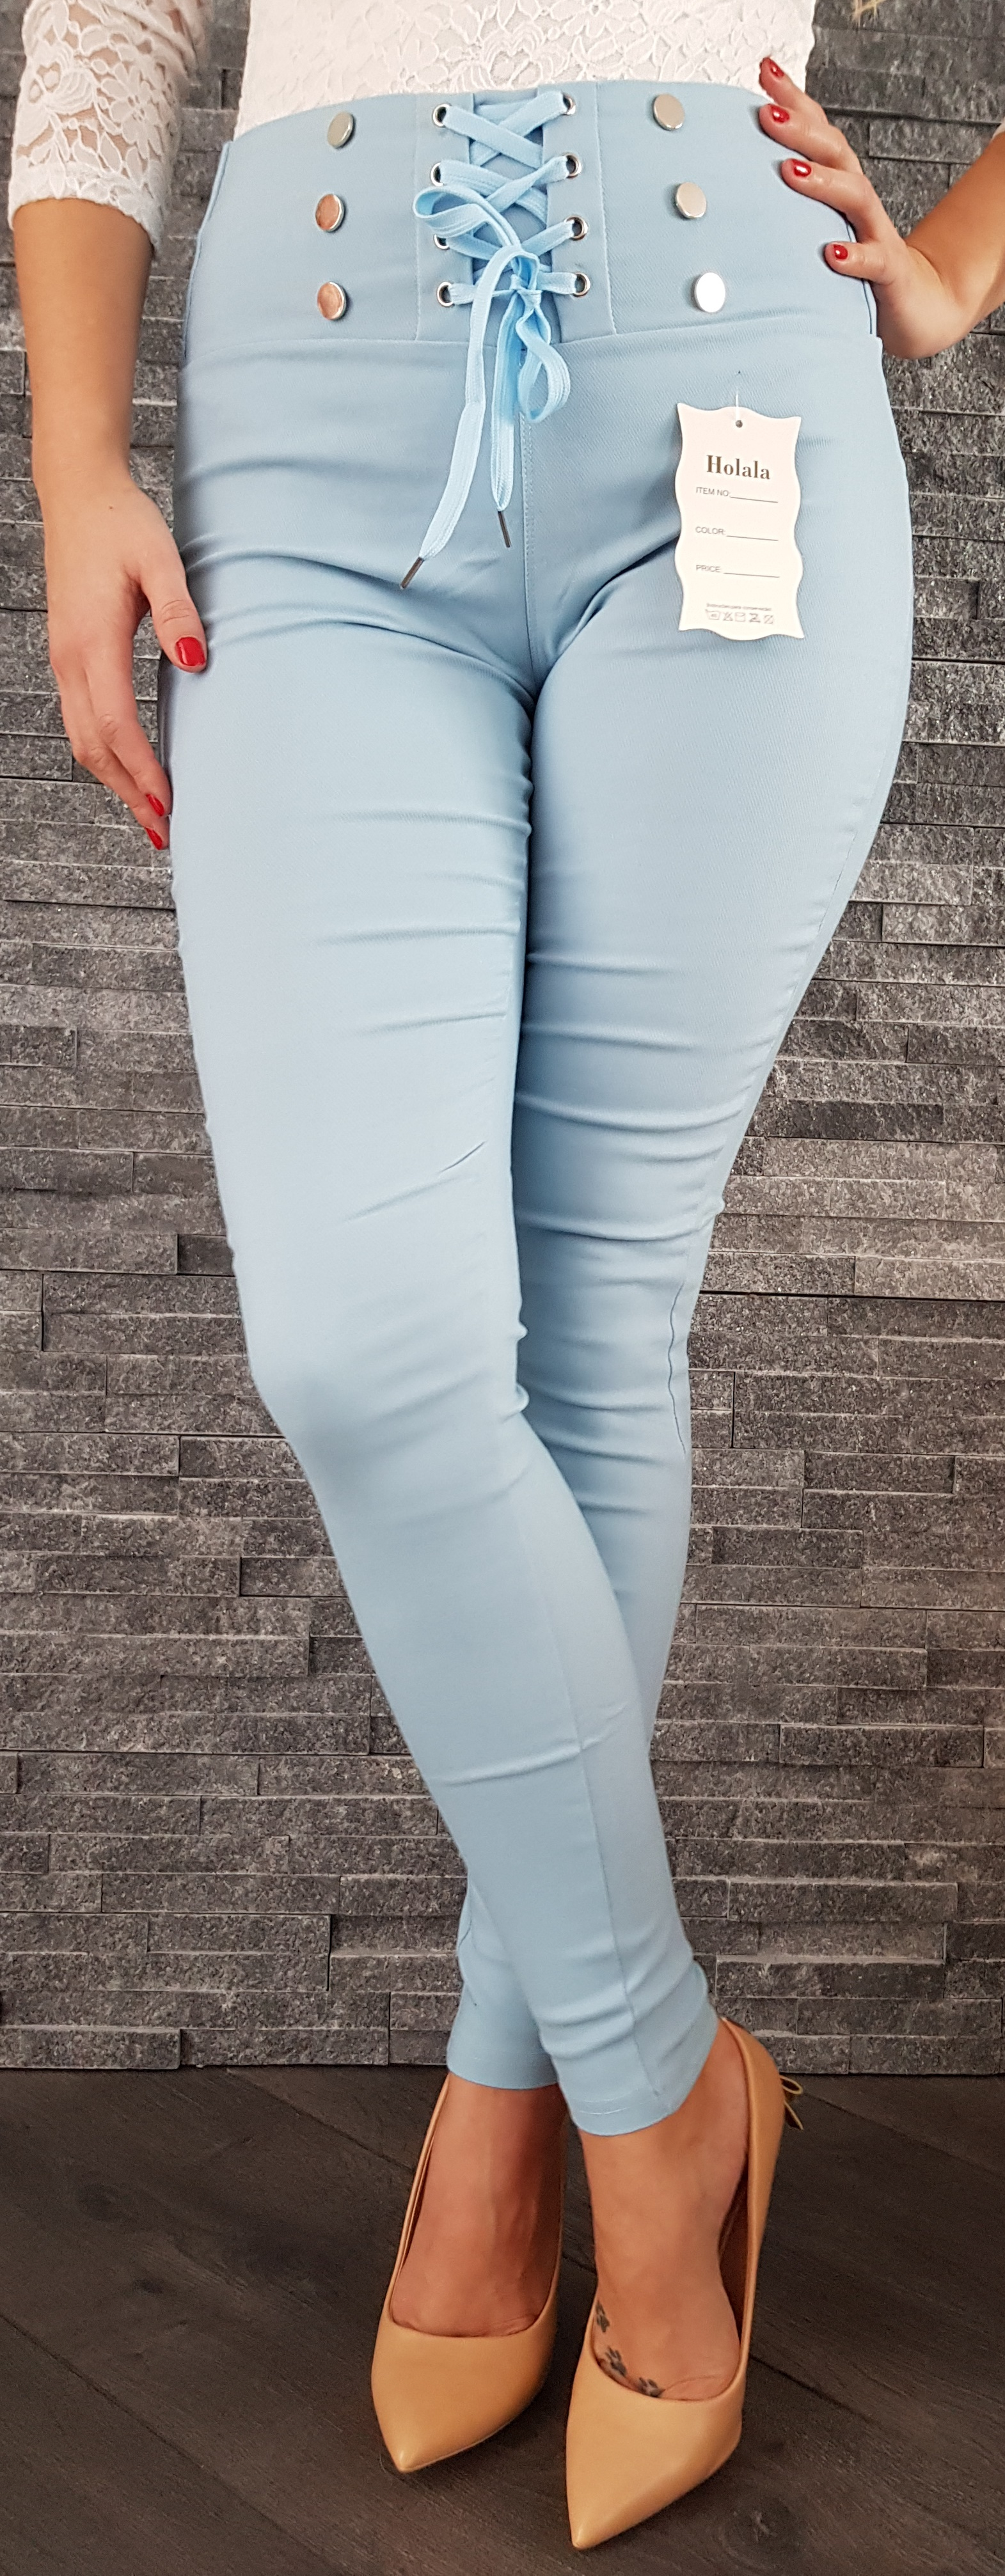 c7c64fdf2f Svetlo modré elastické nohavice s vysokým pásom